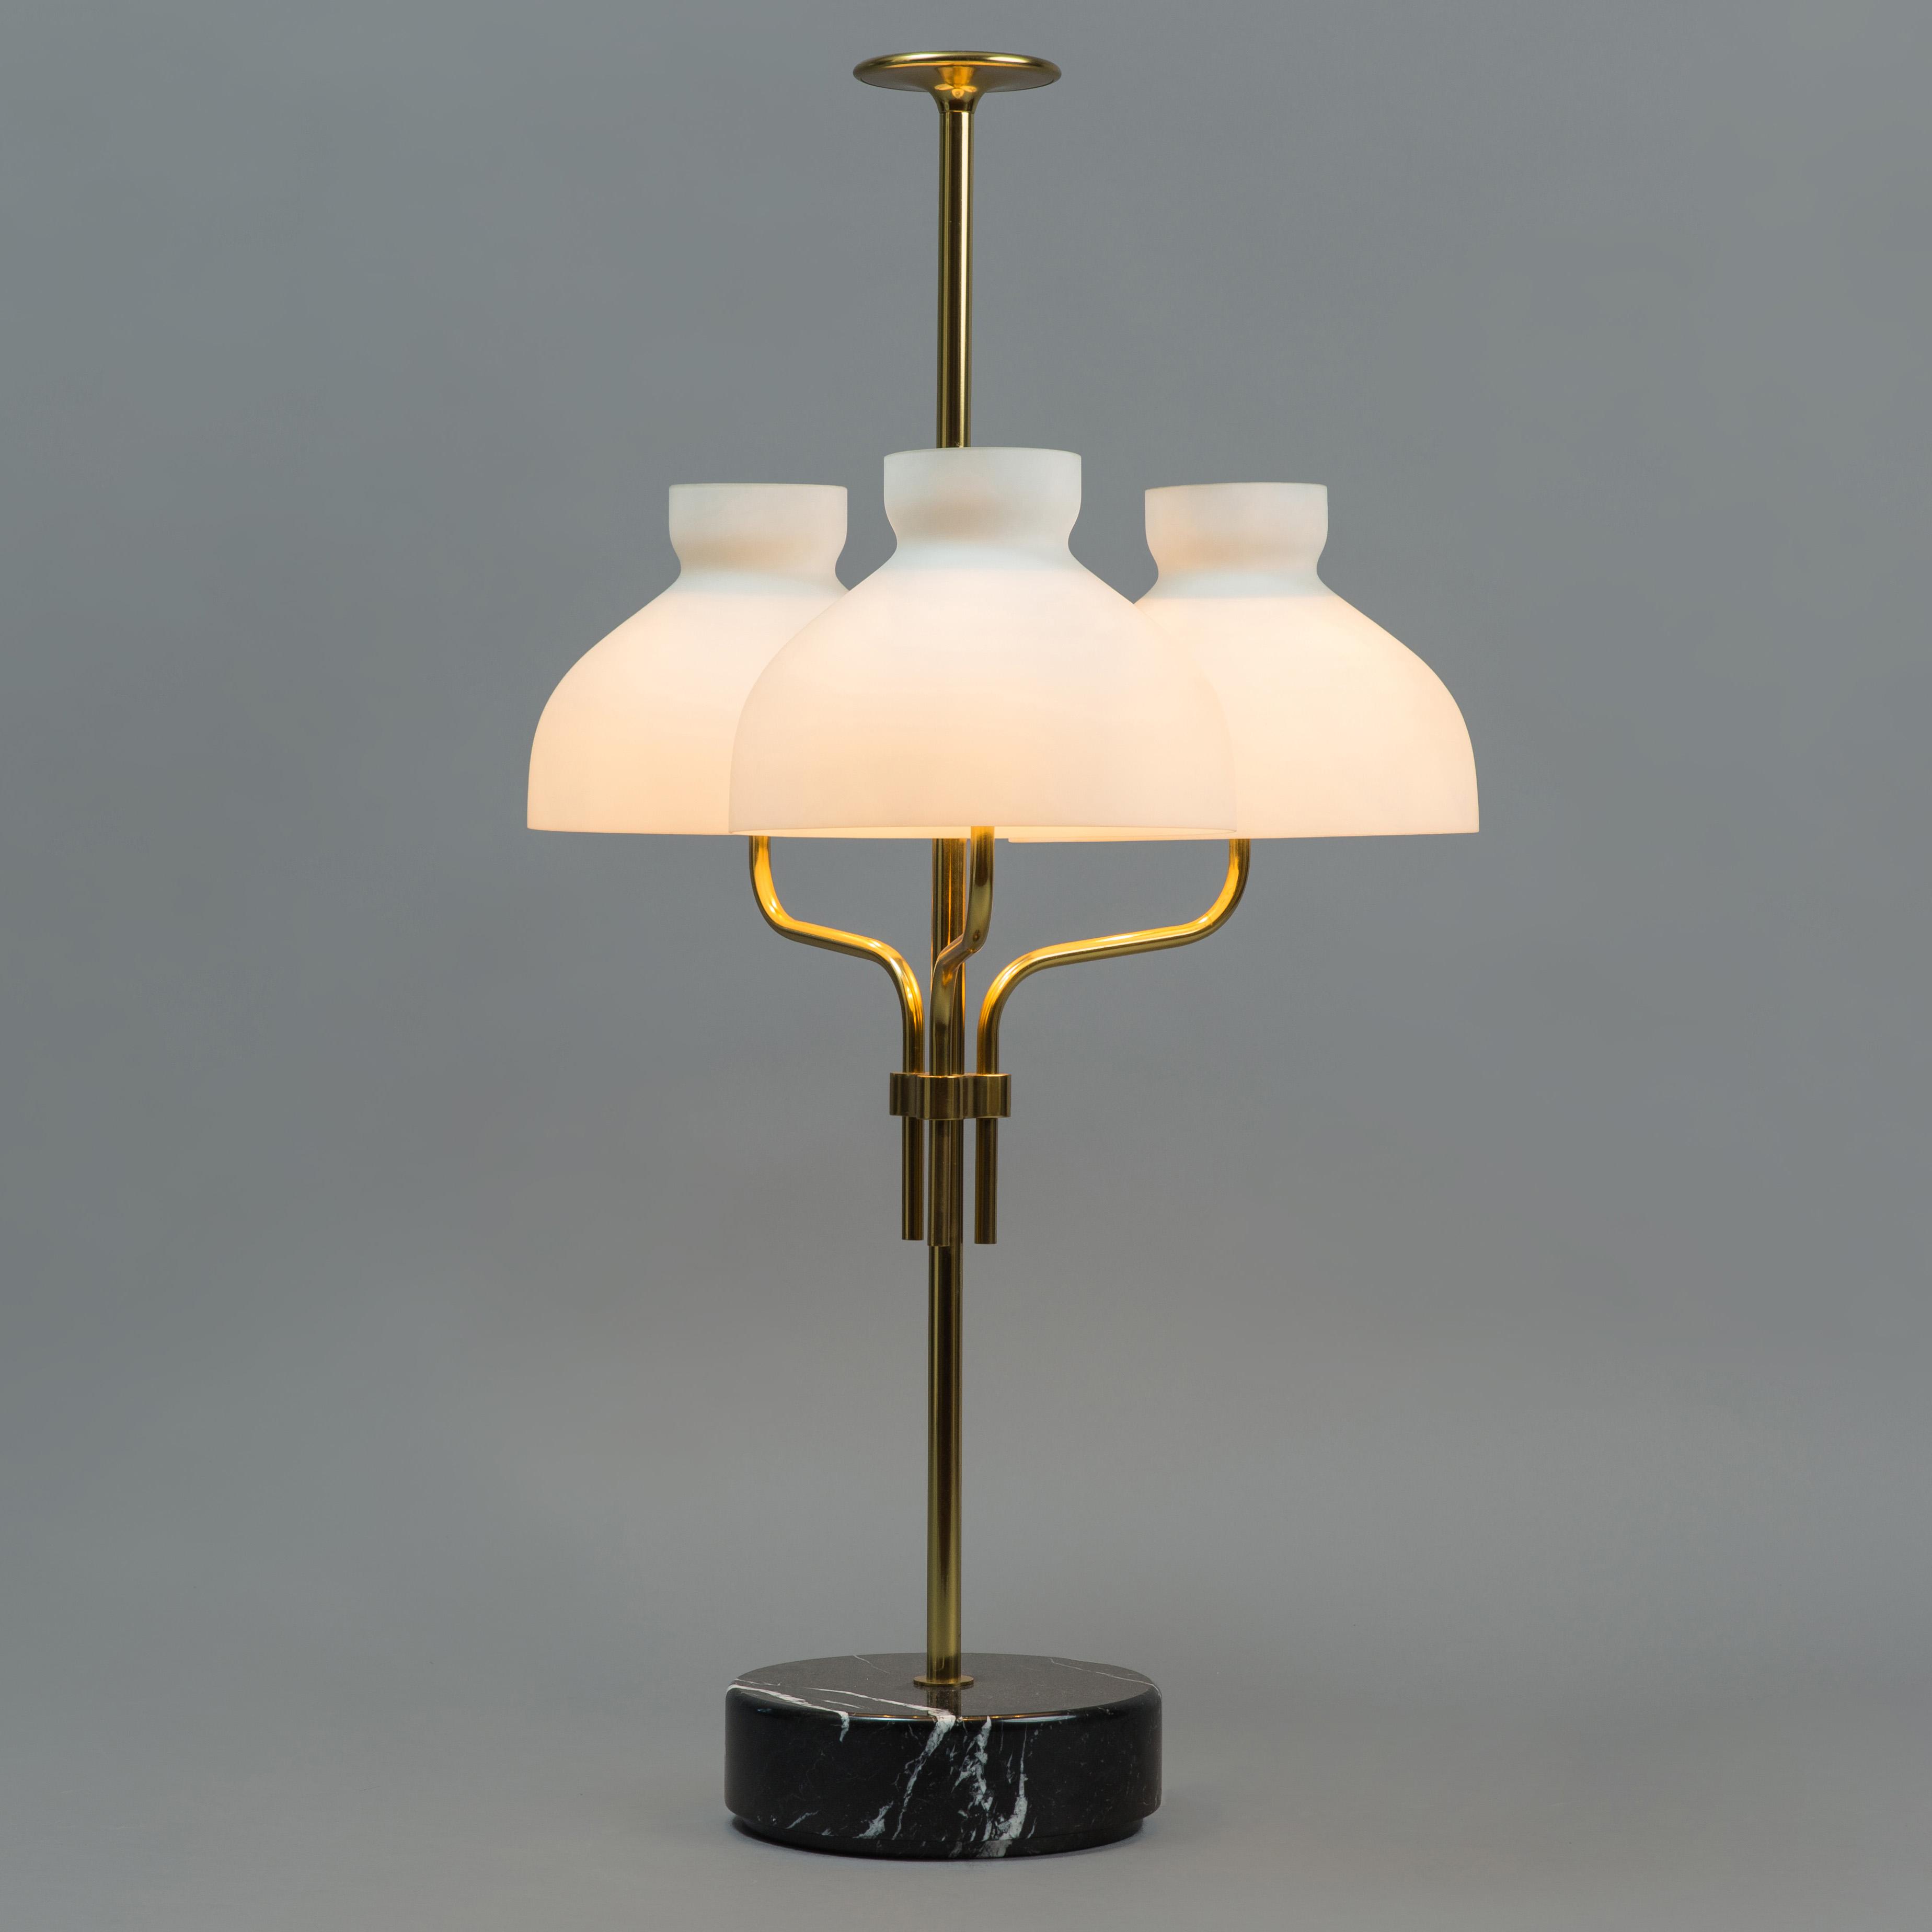 'Arenzano tre fiamme' Table Lamp by Ignazio Gardella for Azucena | soyun k.